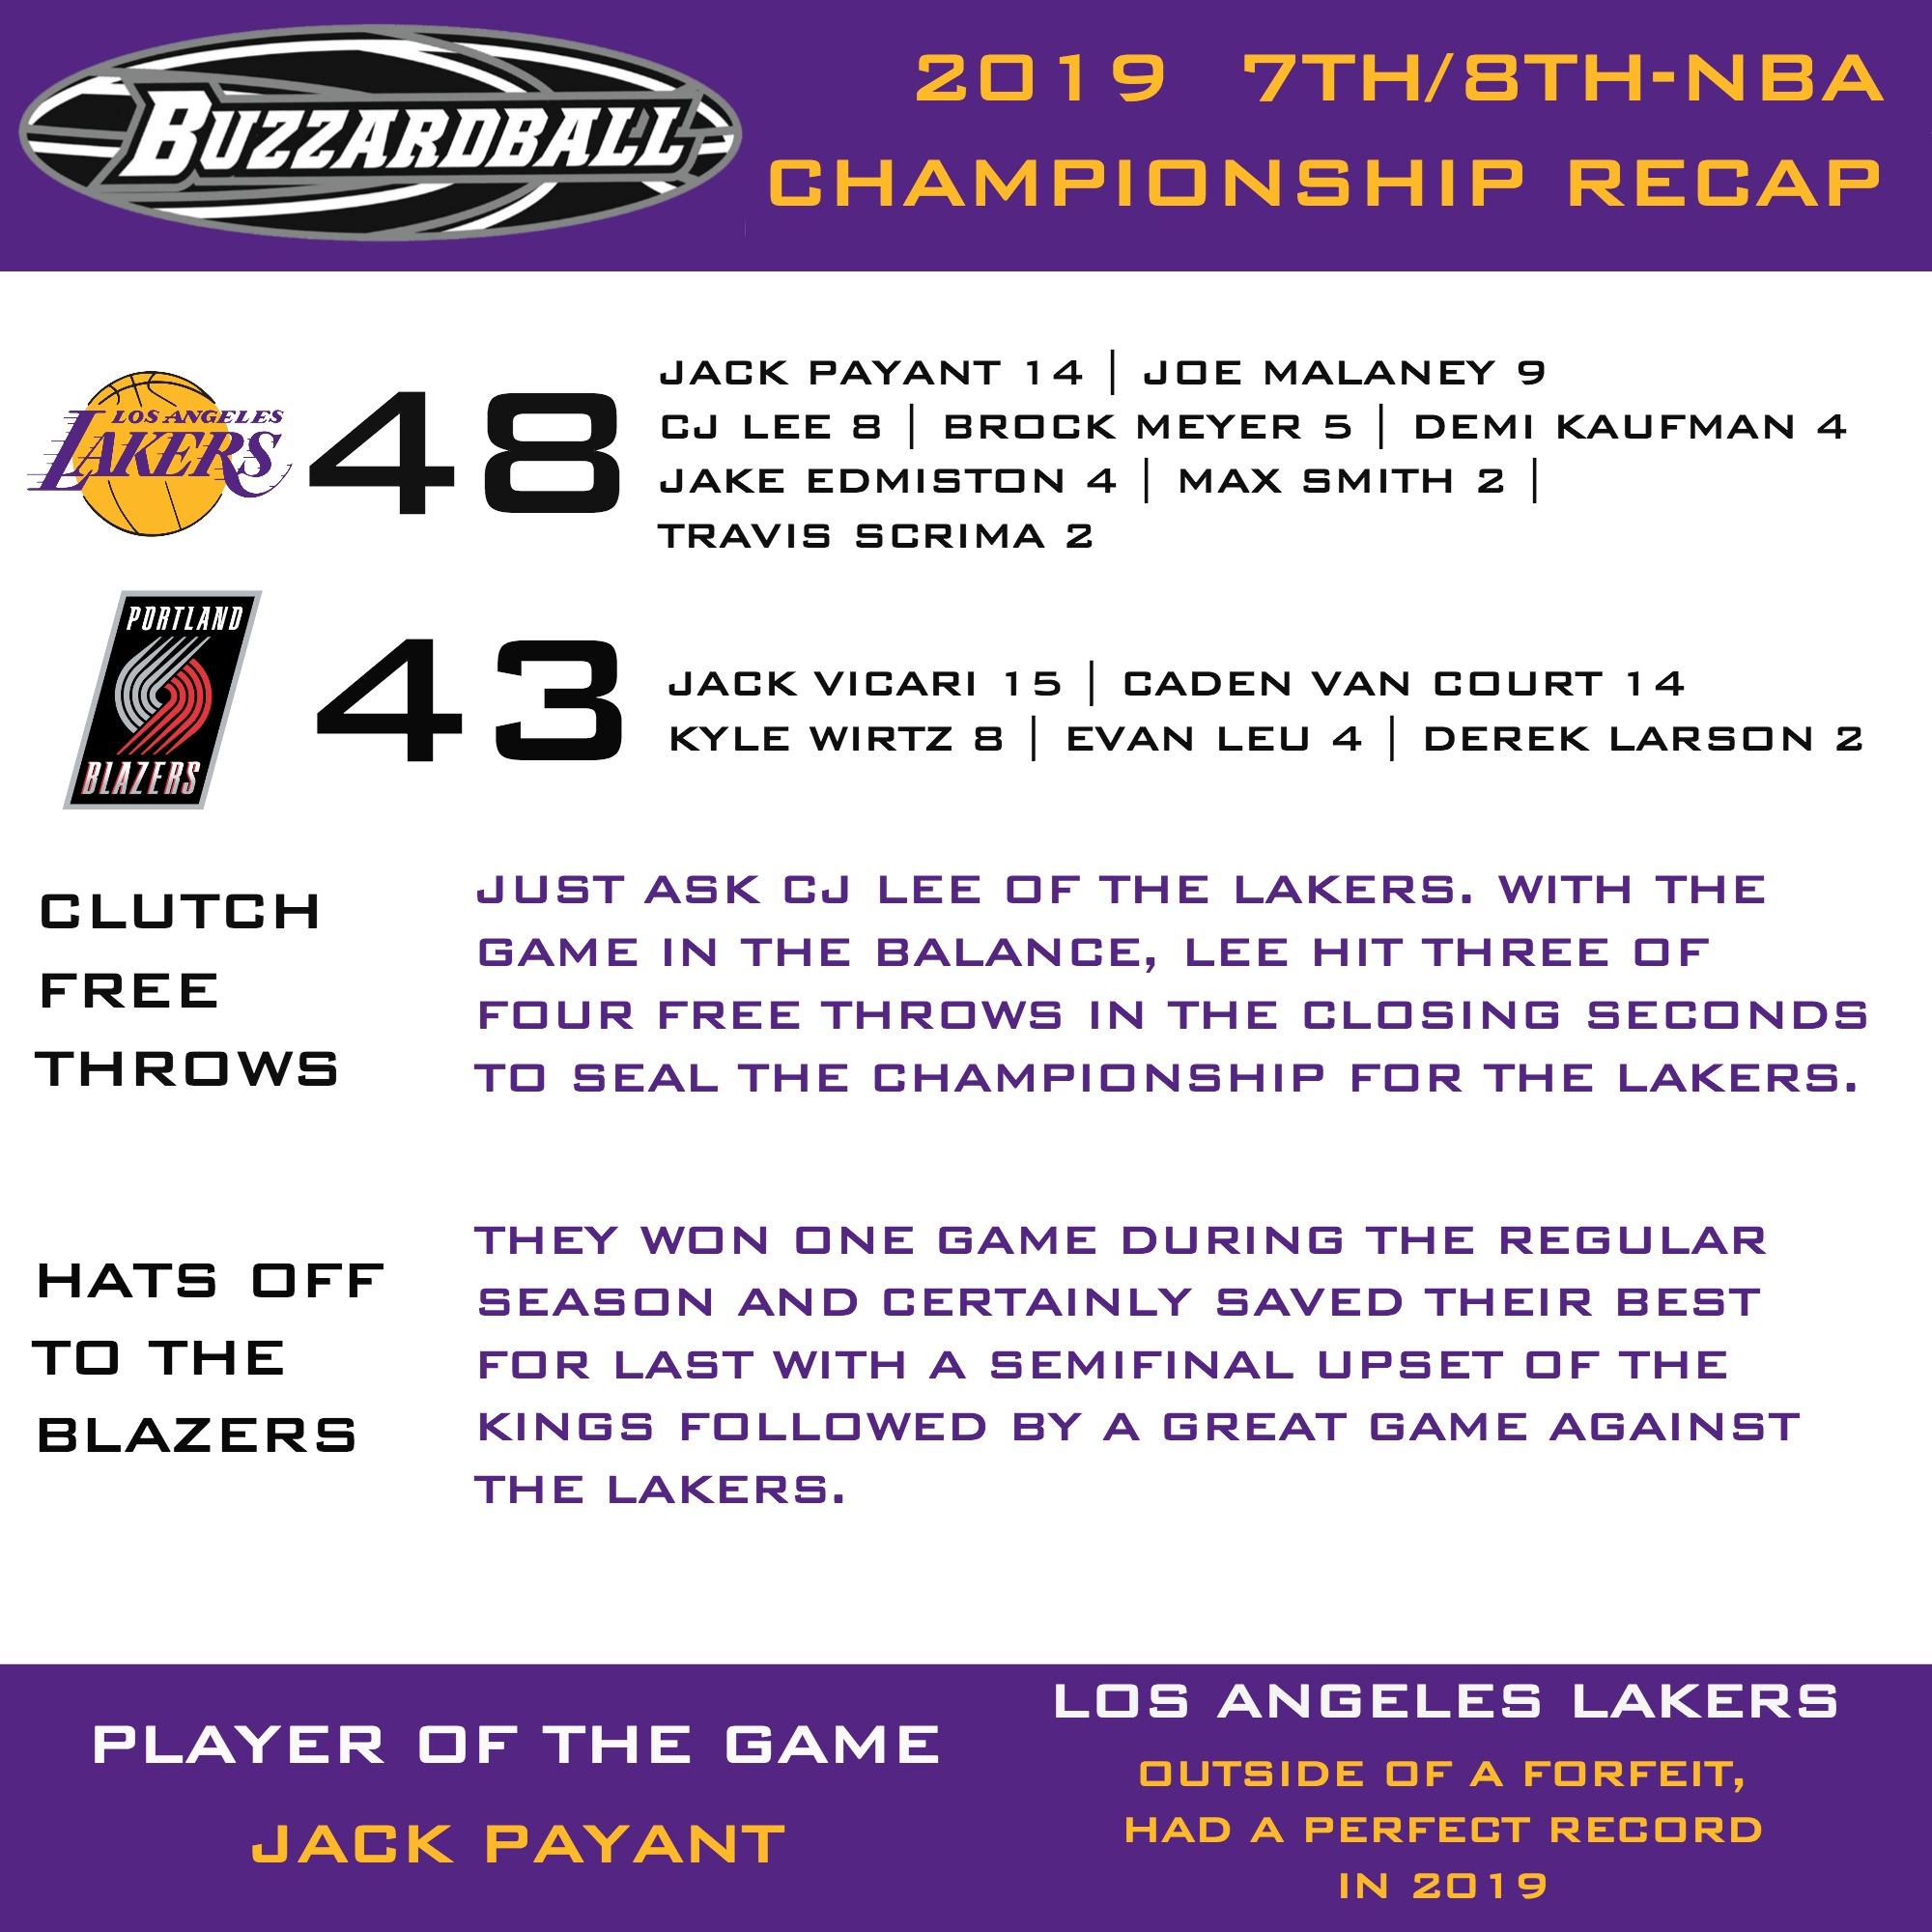 78 NBA Championship Recap.jpg